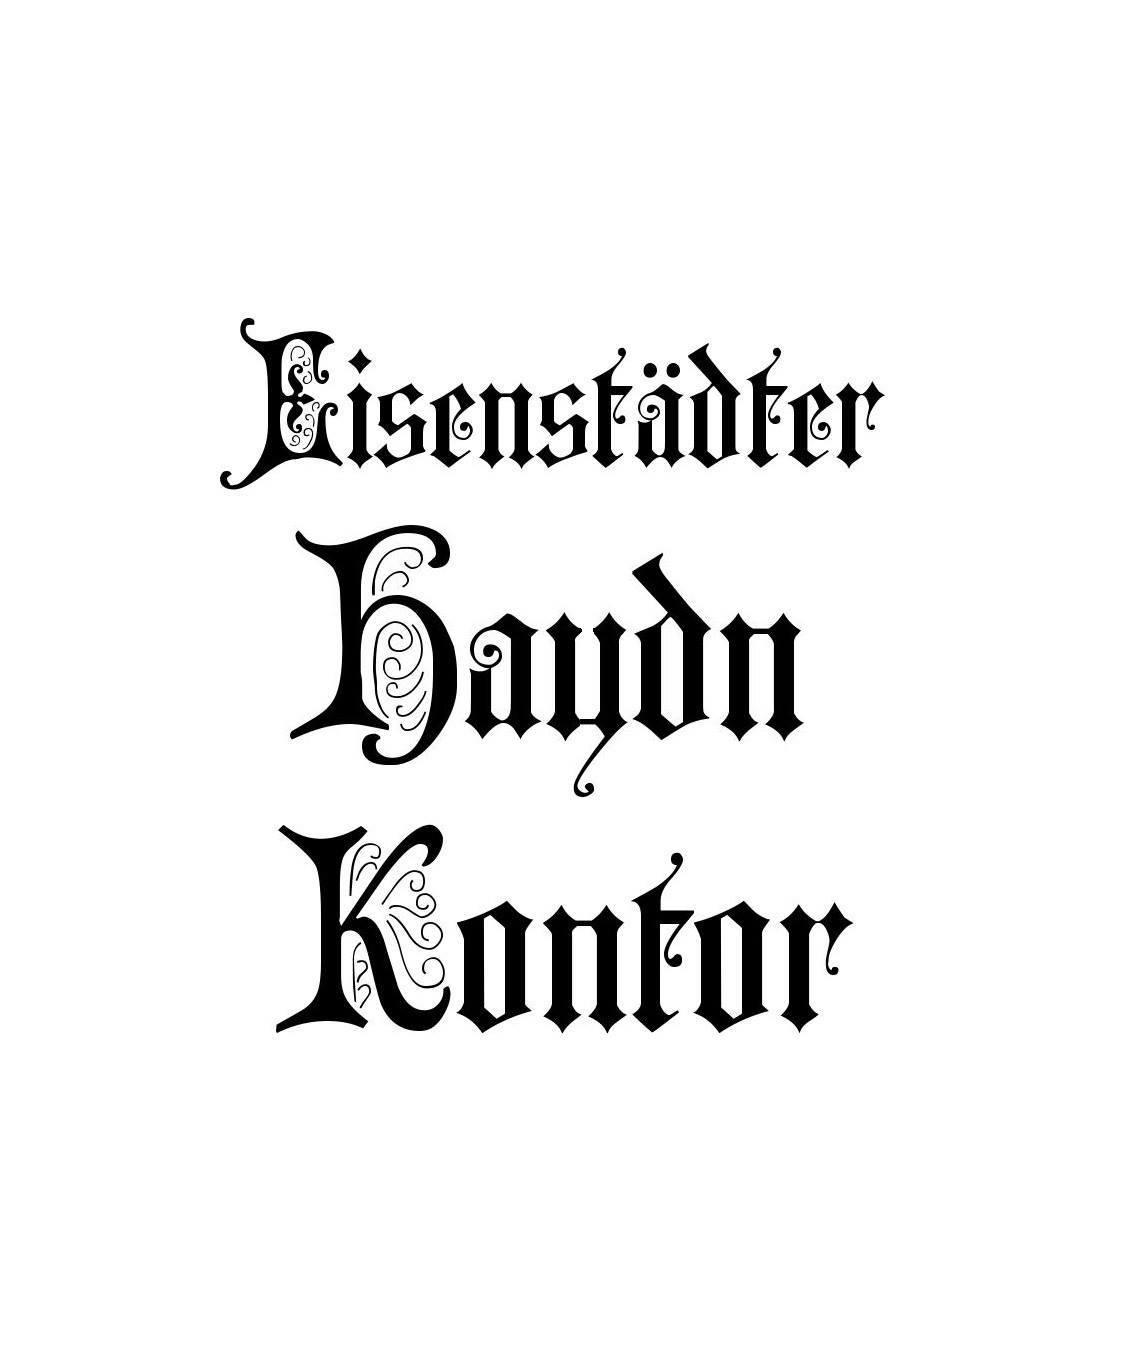 Eisenstädter Haydn Kontor Logo